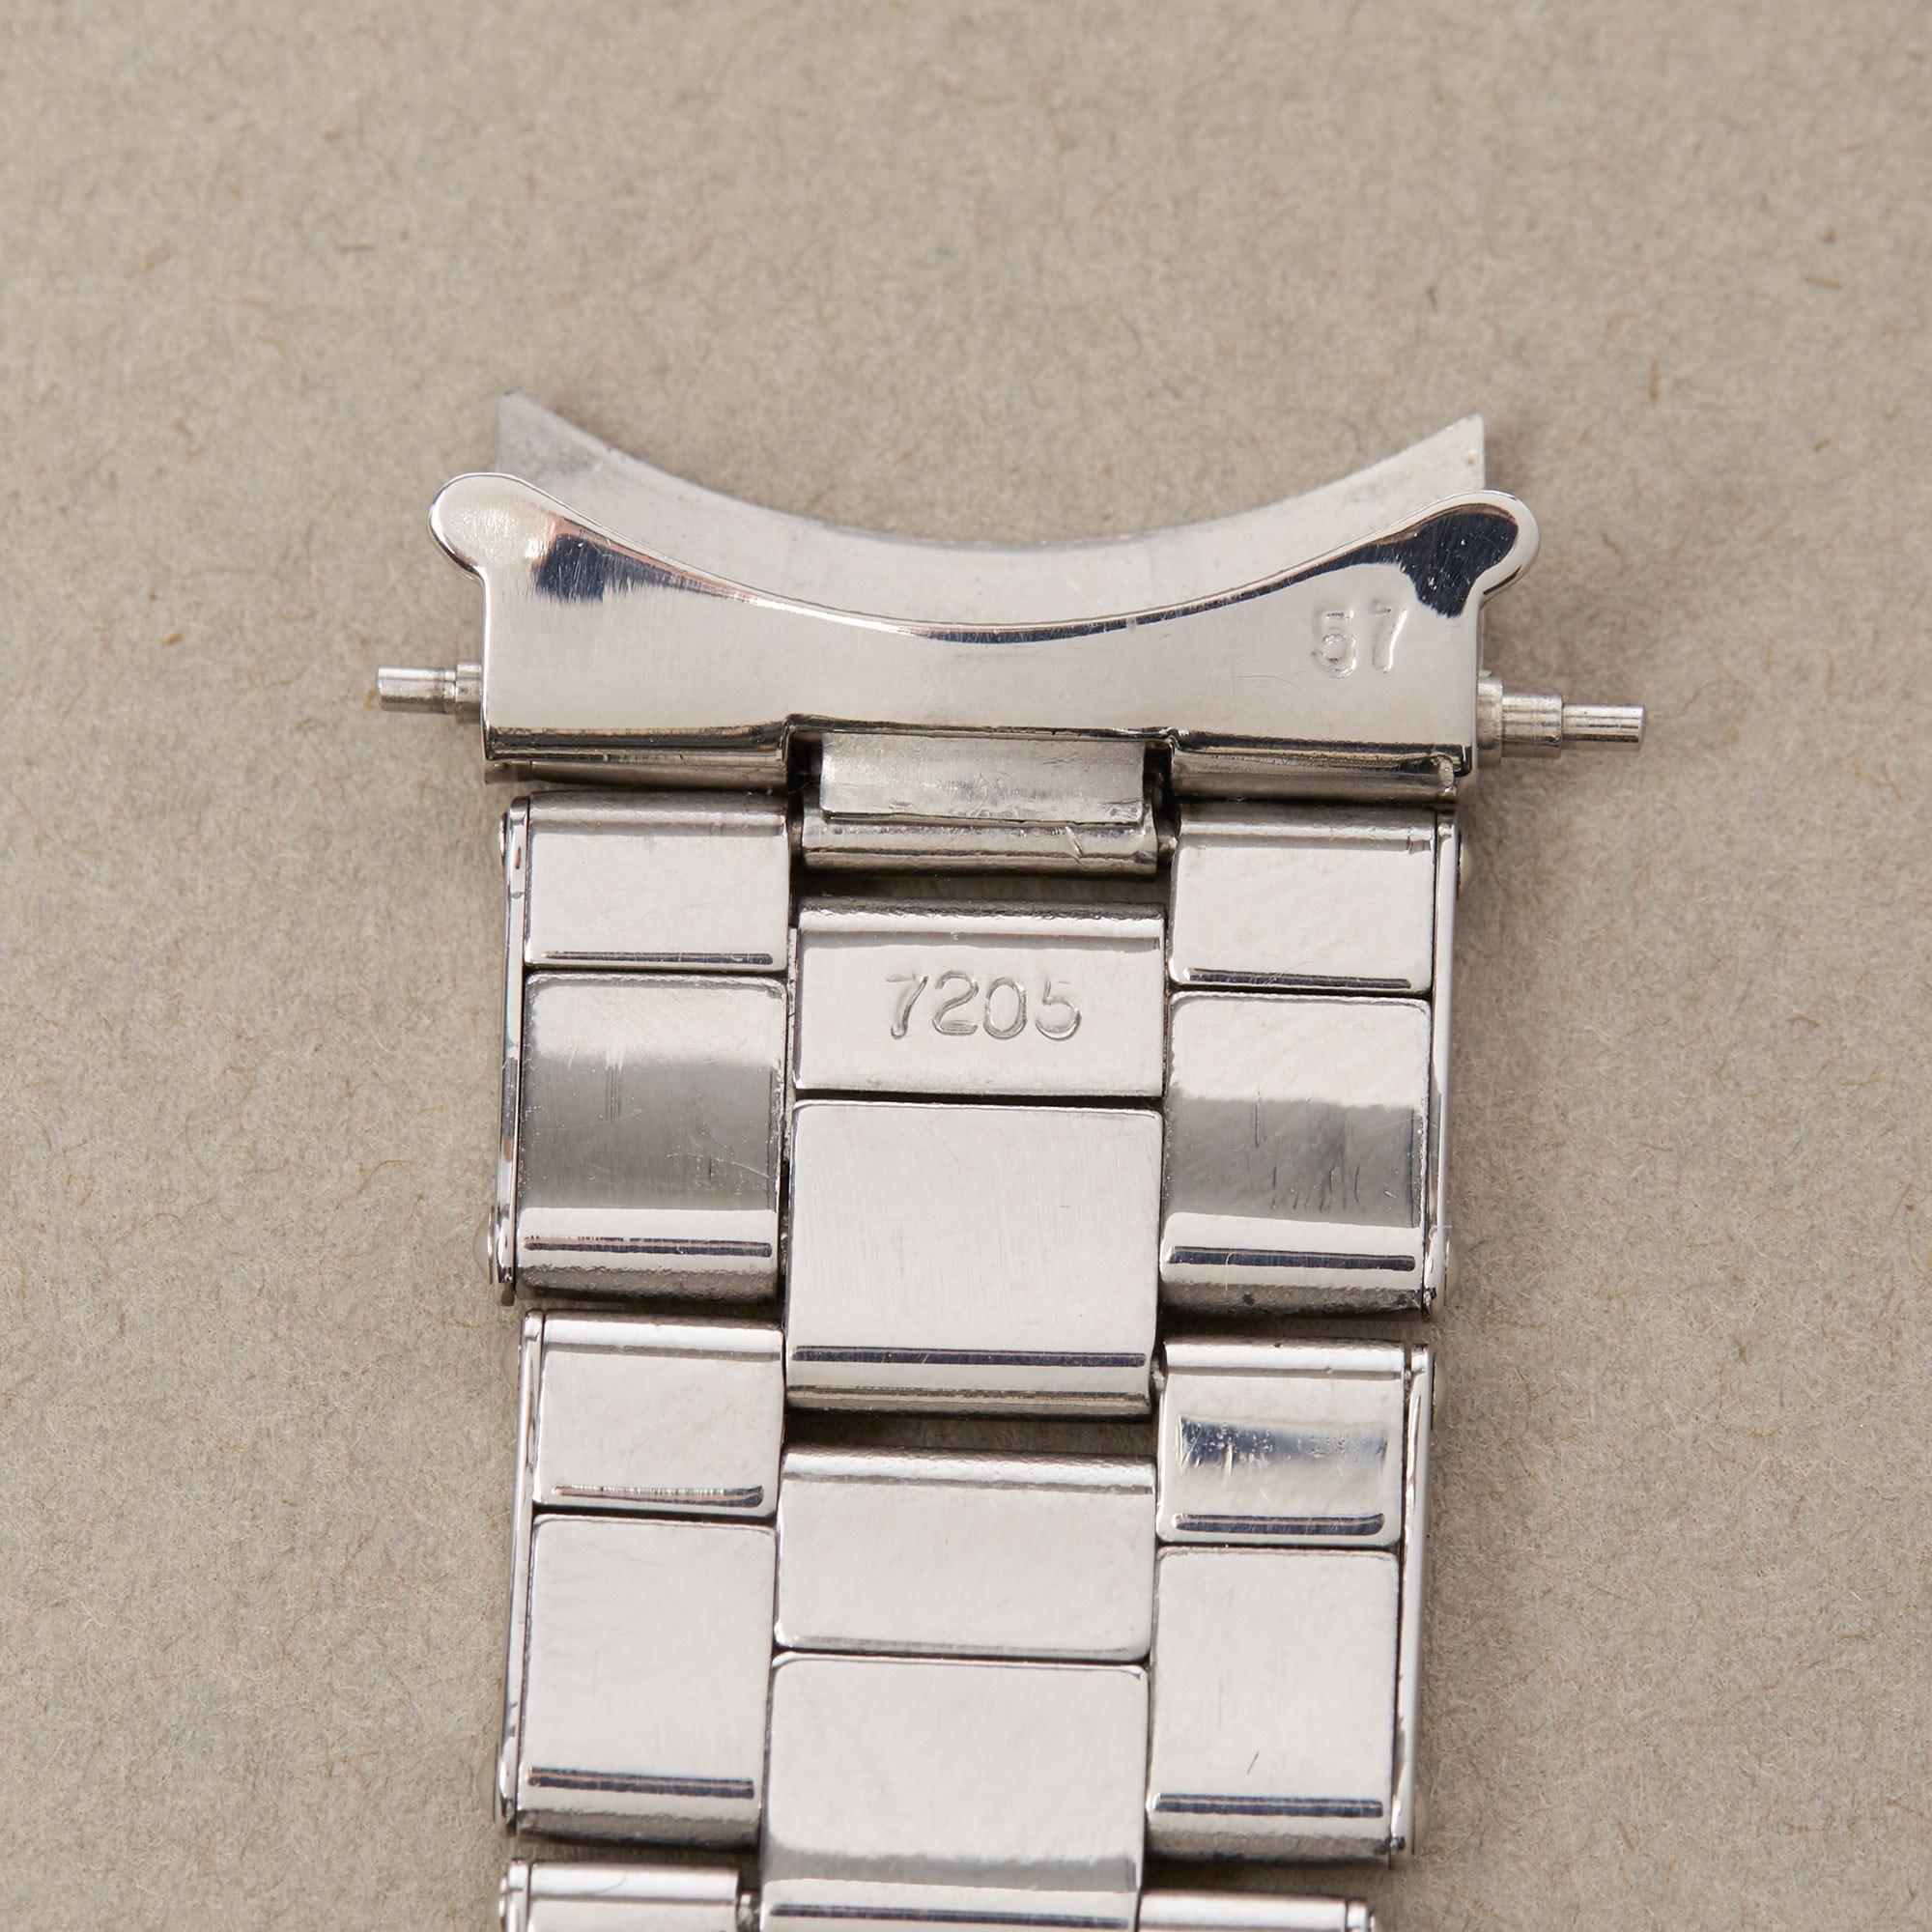 Rolex Daytona Stainless Steel - 6239 Stainless Steel 6239